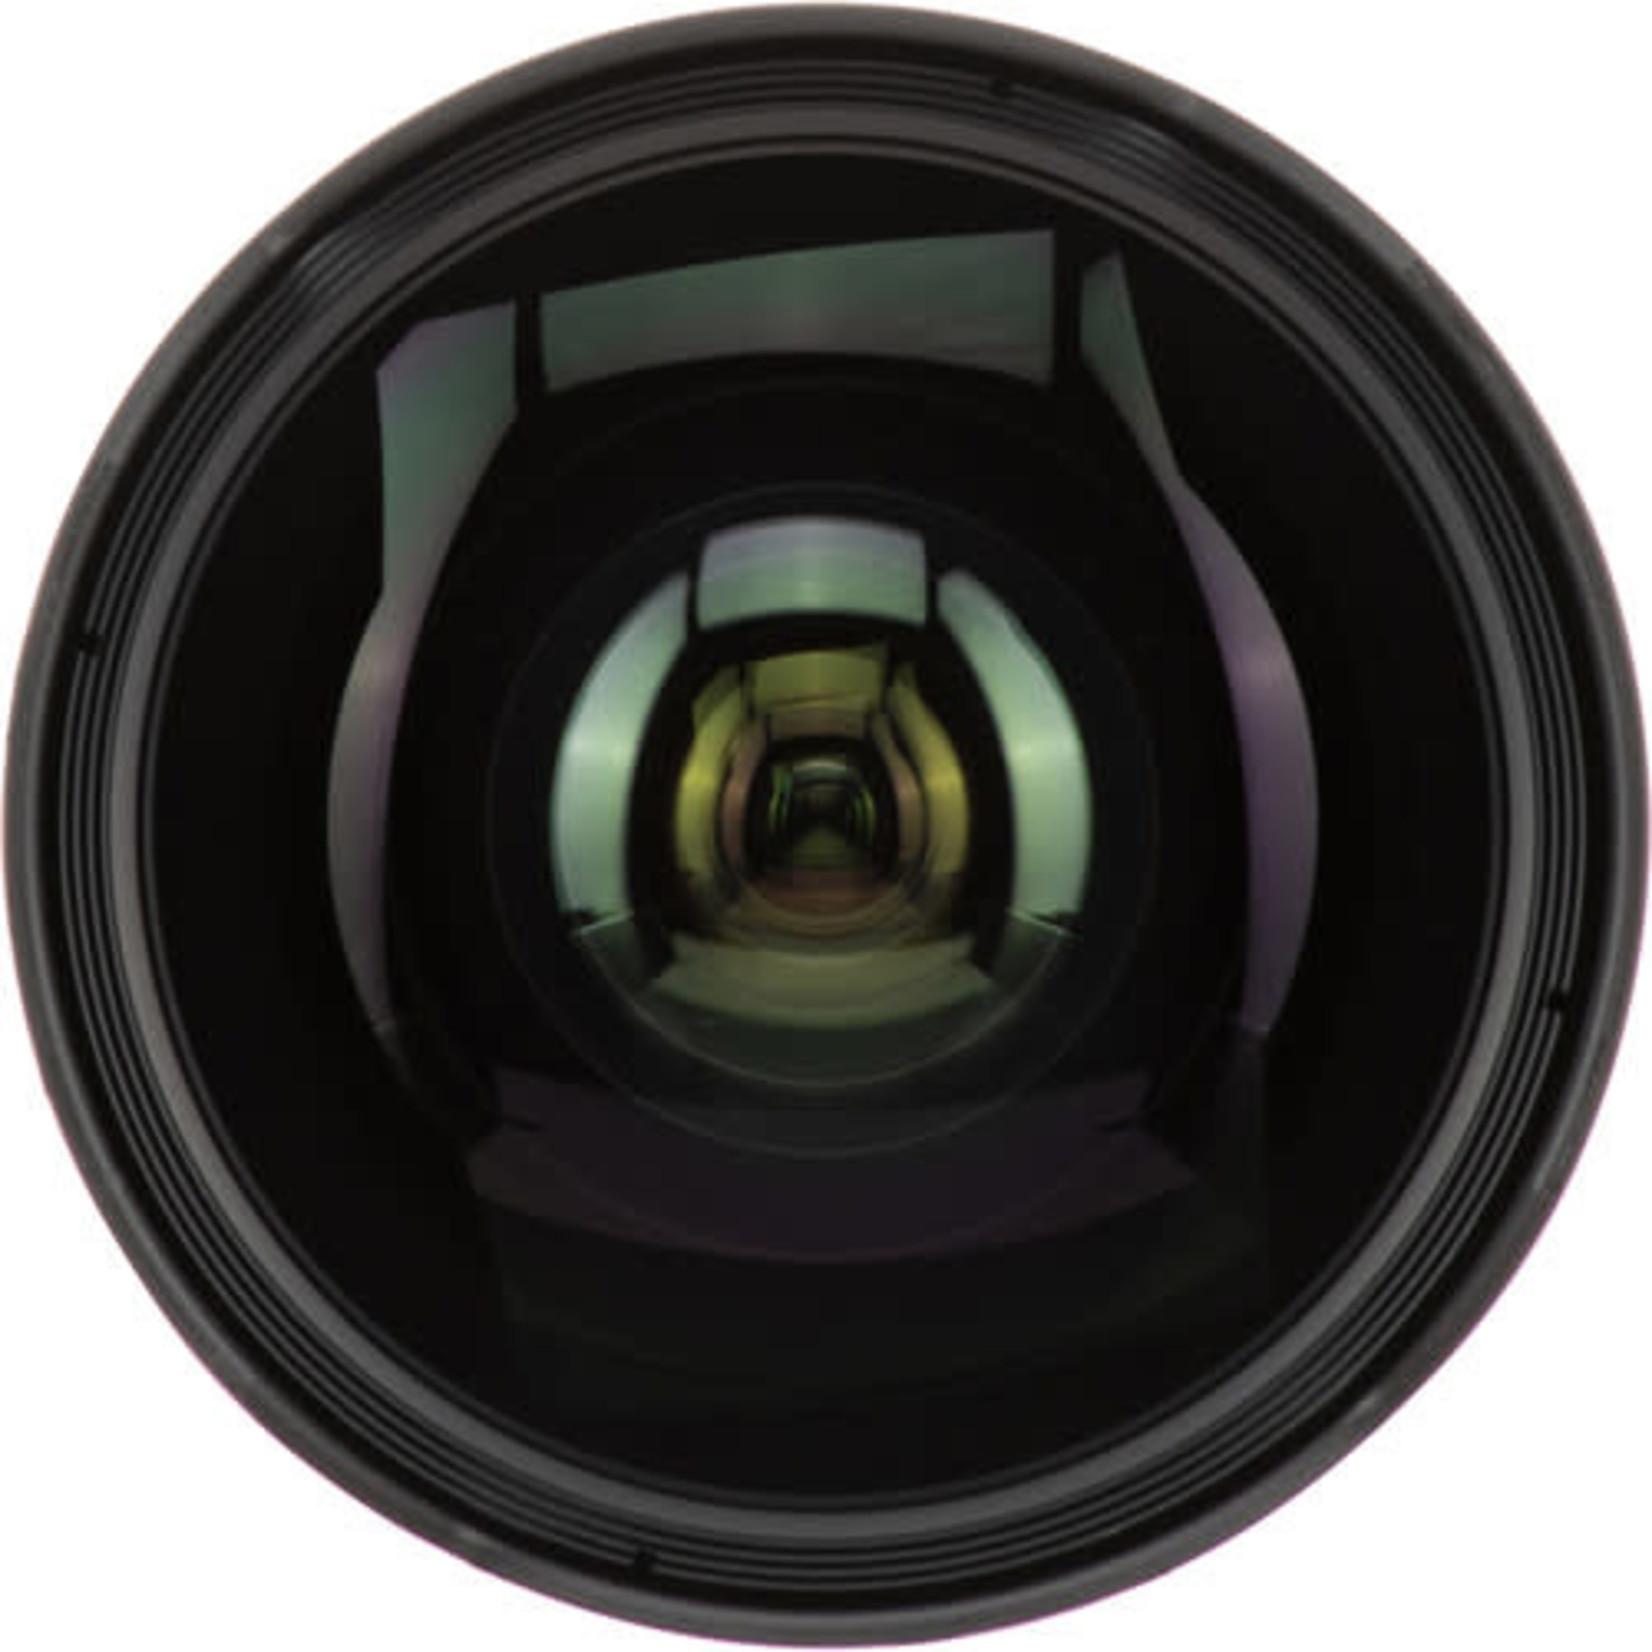 Tokina Tokina Opera 16-28mm f/2.8 for Canon